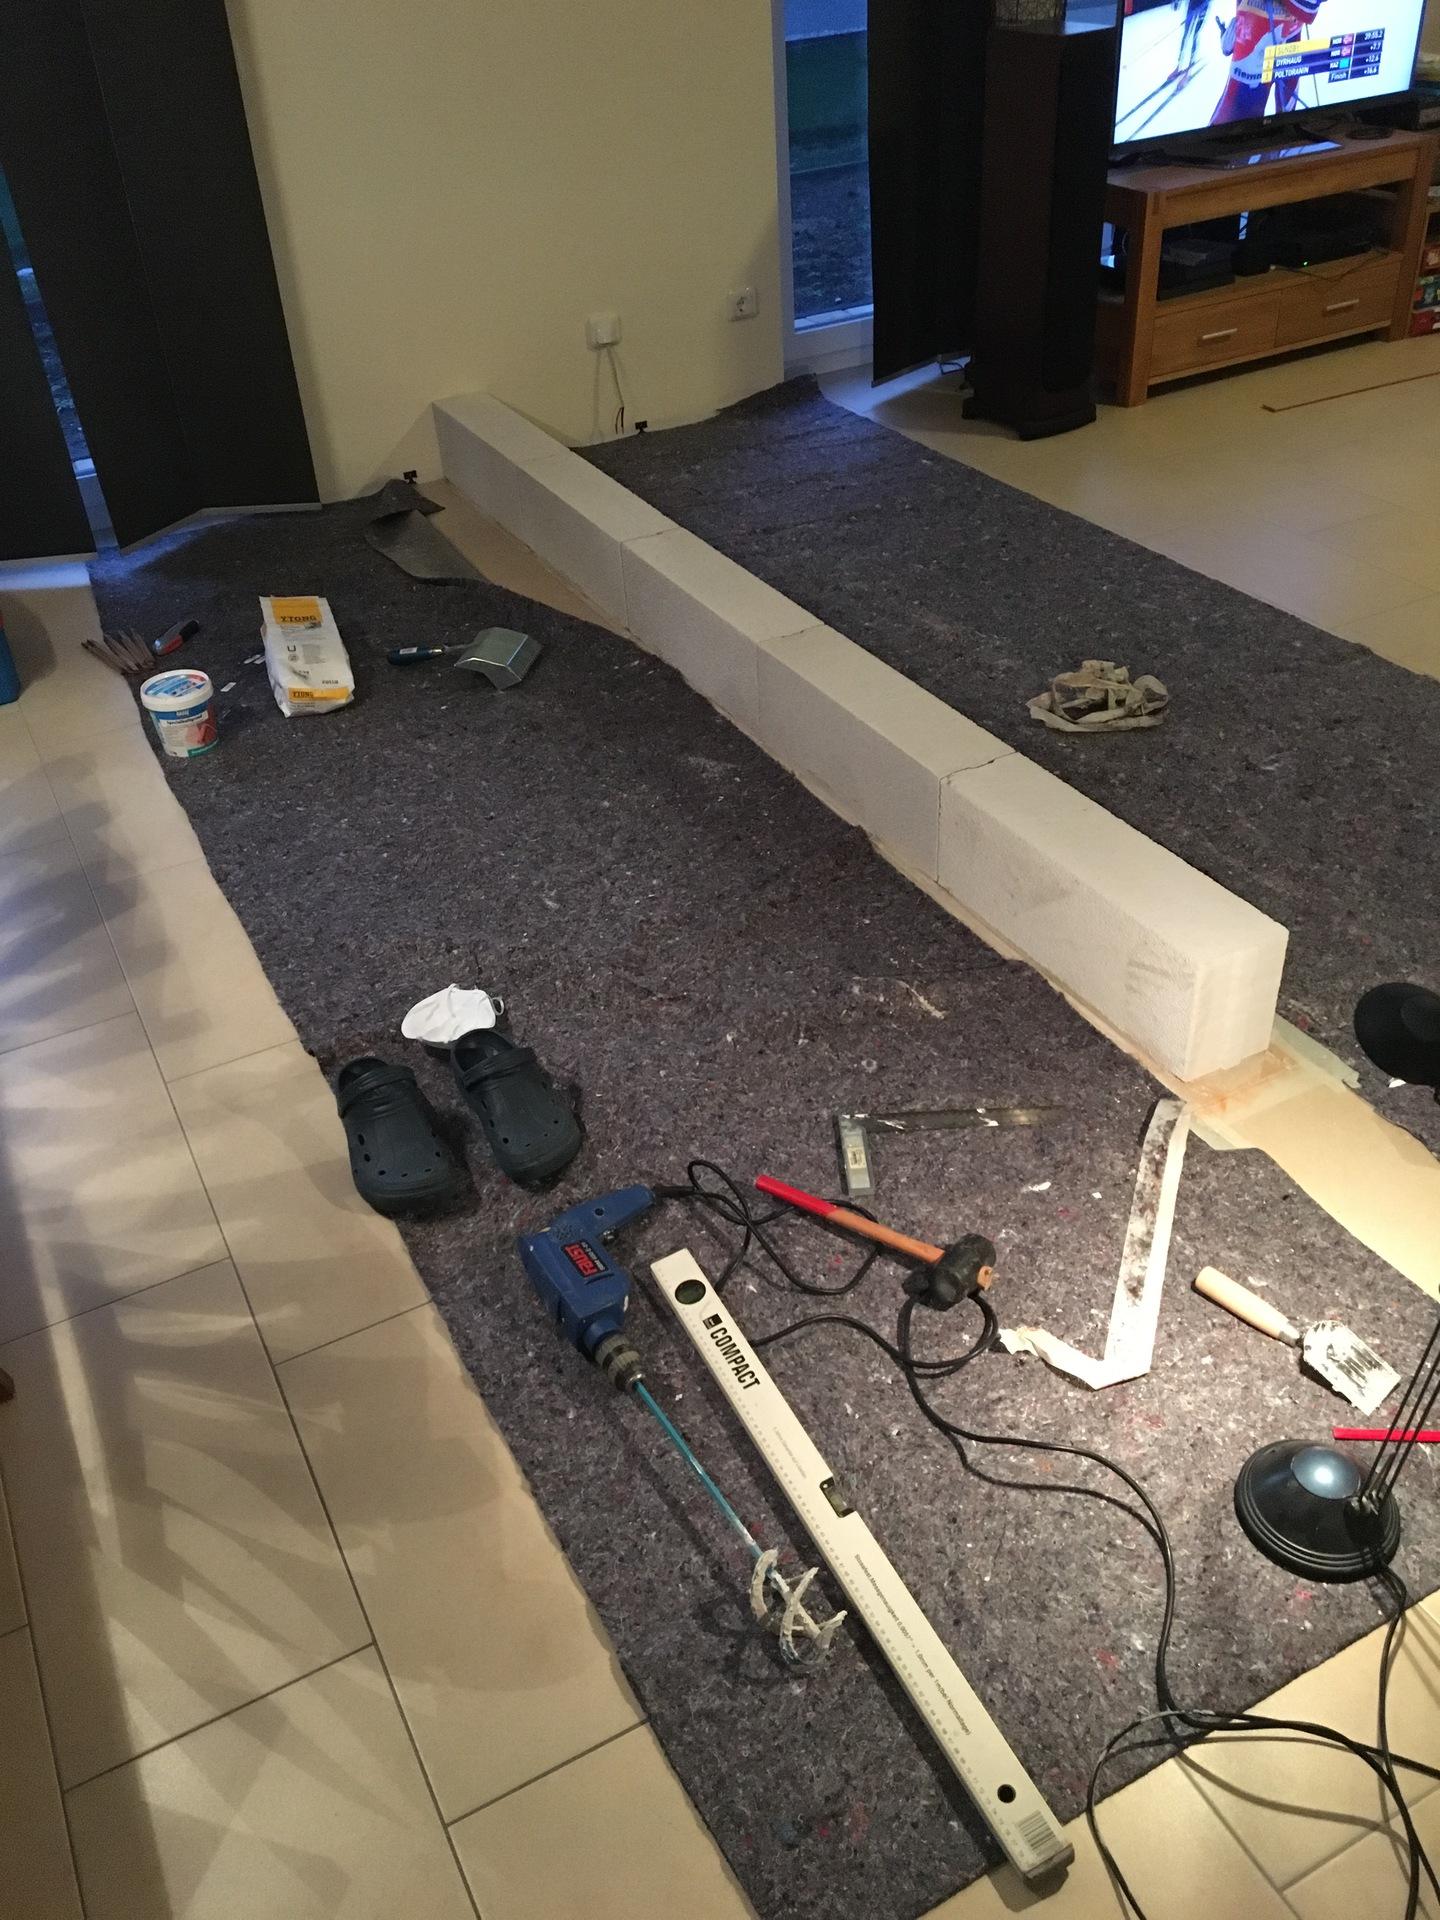 tv wand doityourself hifiwand laminatwand tvwand. Black Bedroom Furniture Sets. Home Design Ideas